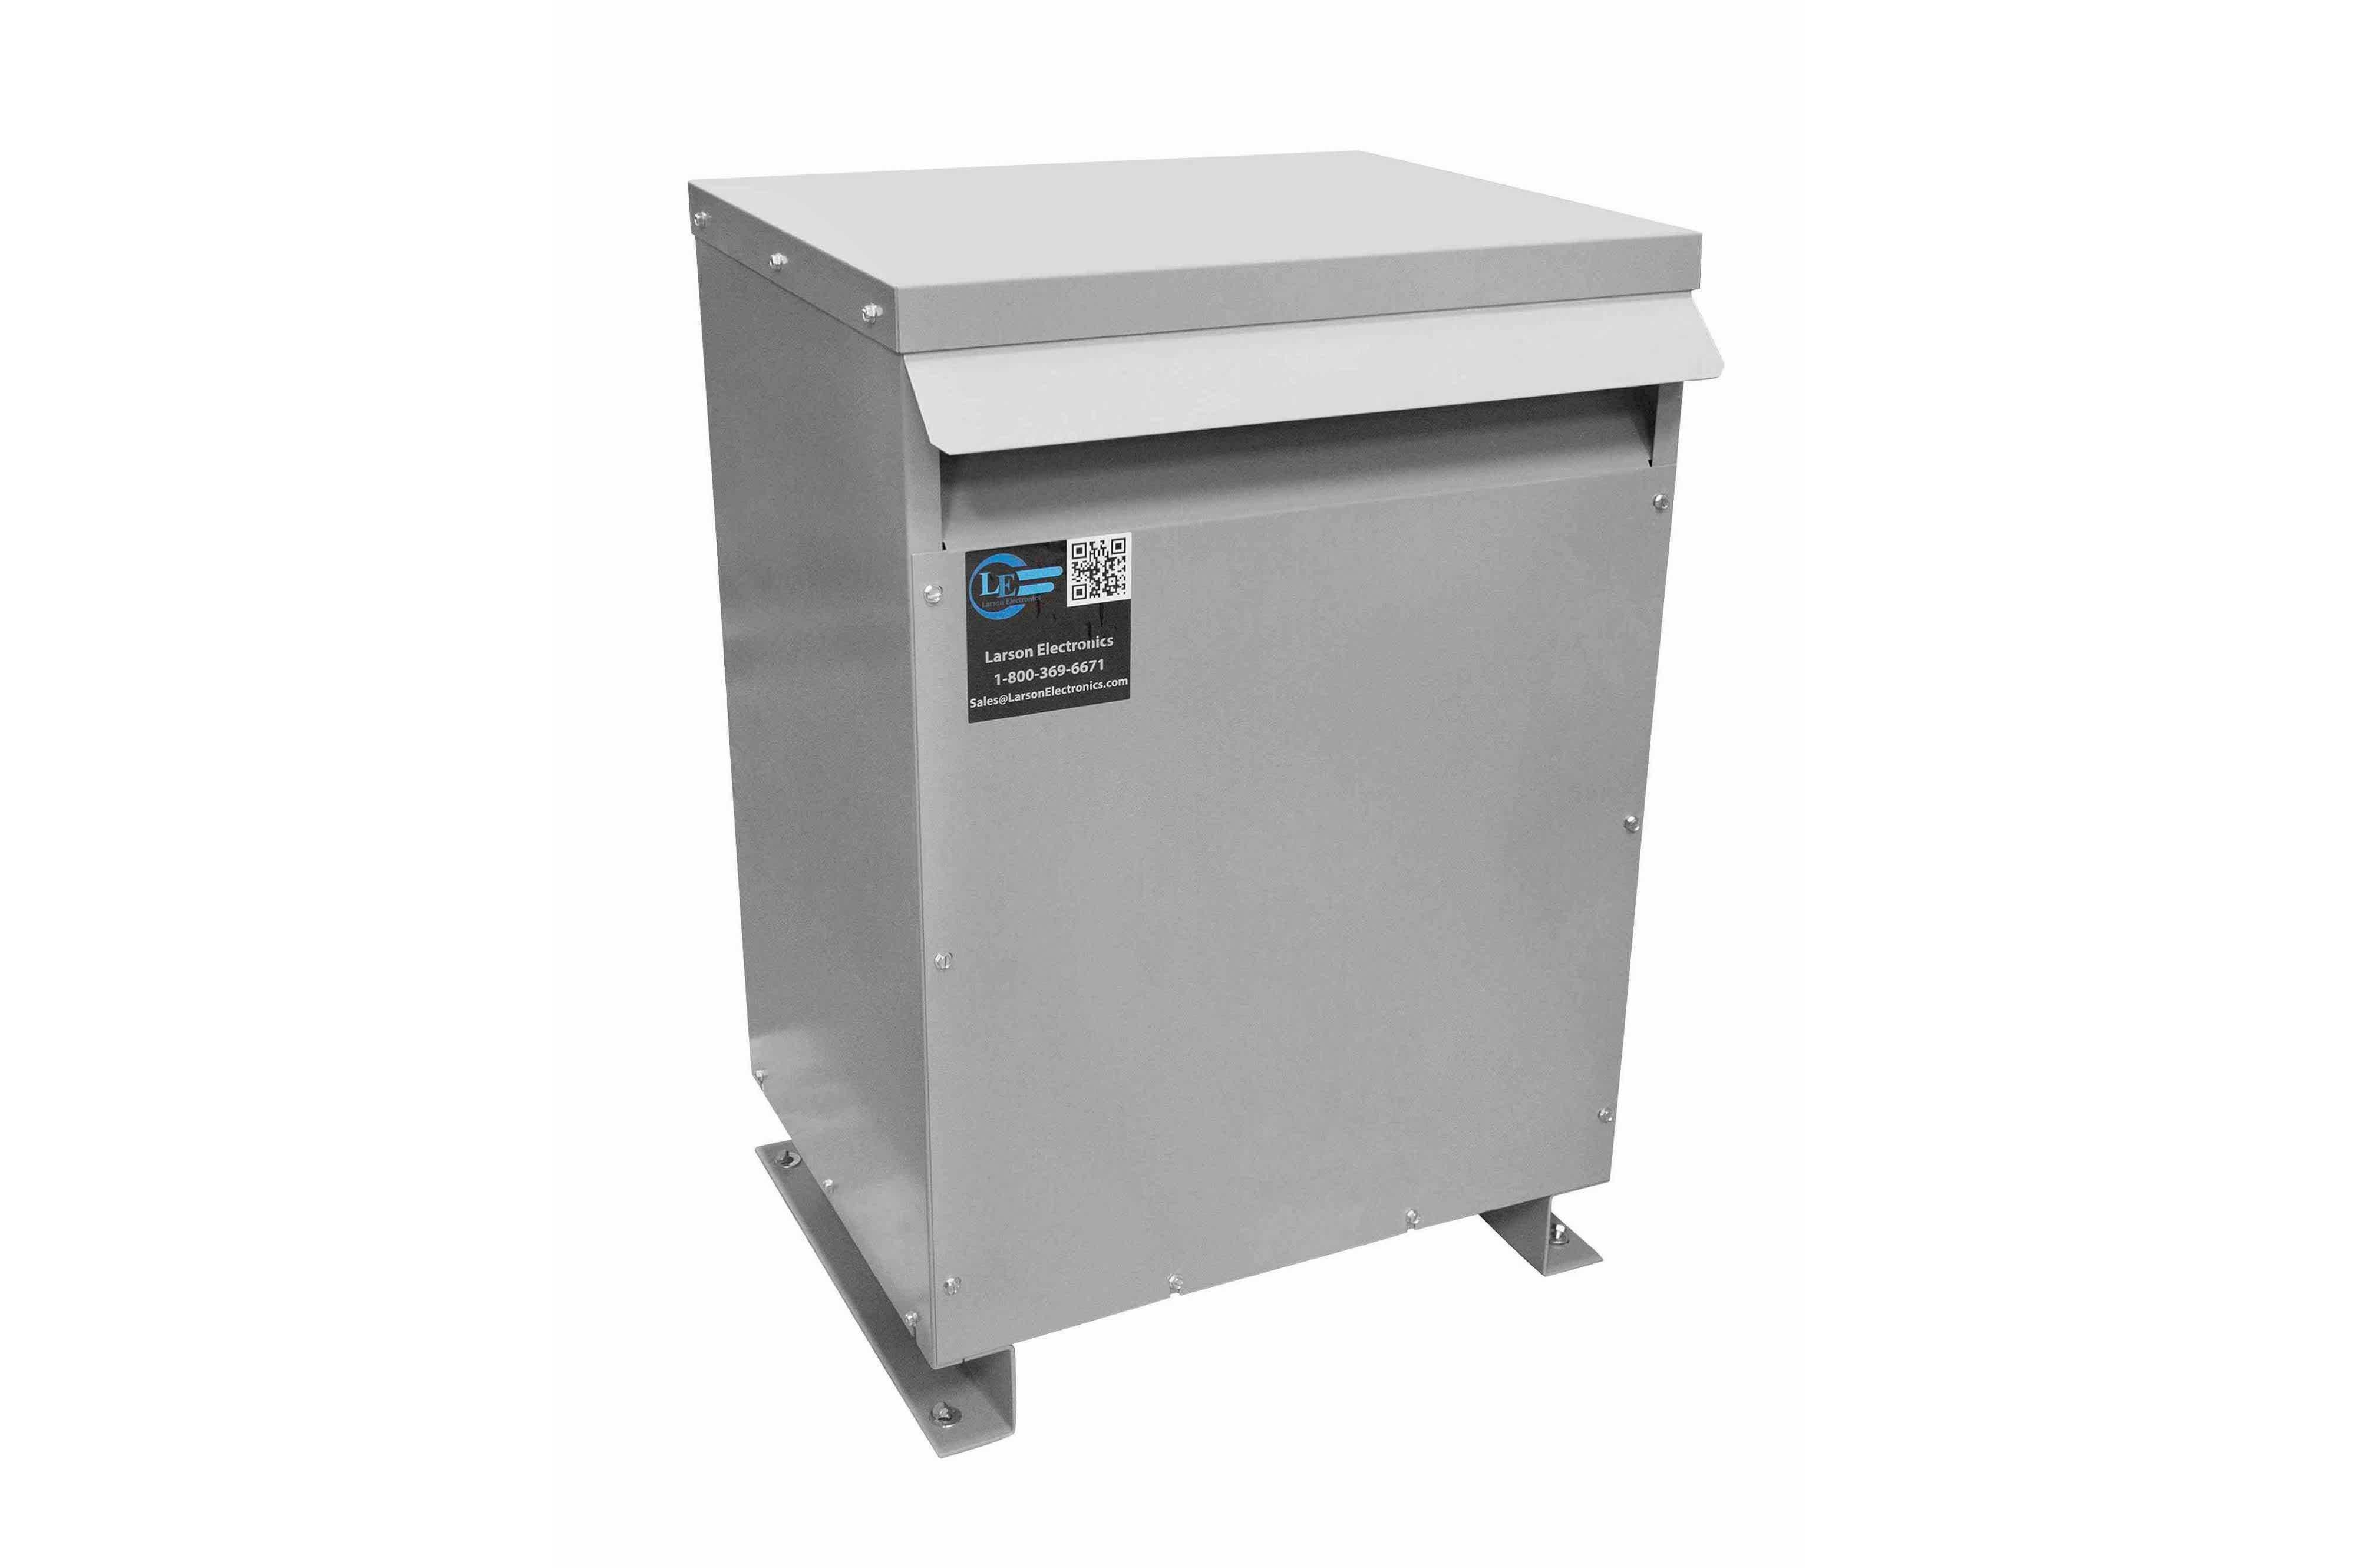 250 kVA 3PH DOE Transformer, 575V Delta Primary, 415Y/240 Wye-N Secondary, N3R, Ventilated, 60 Hz